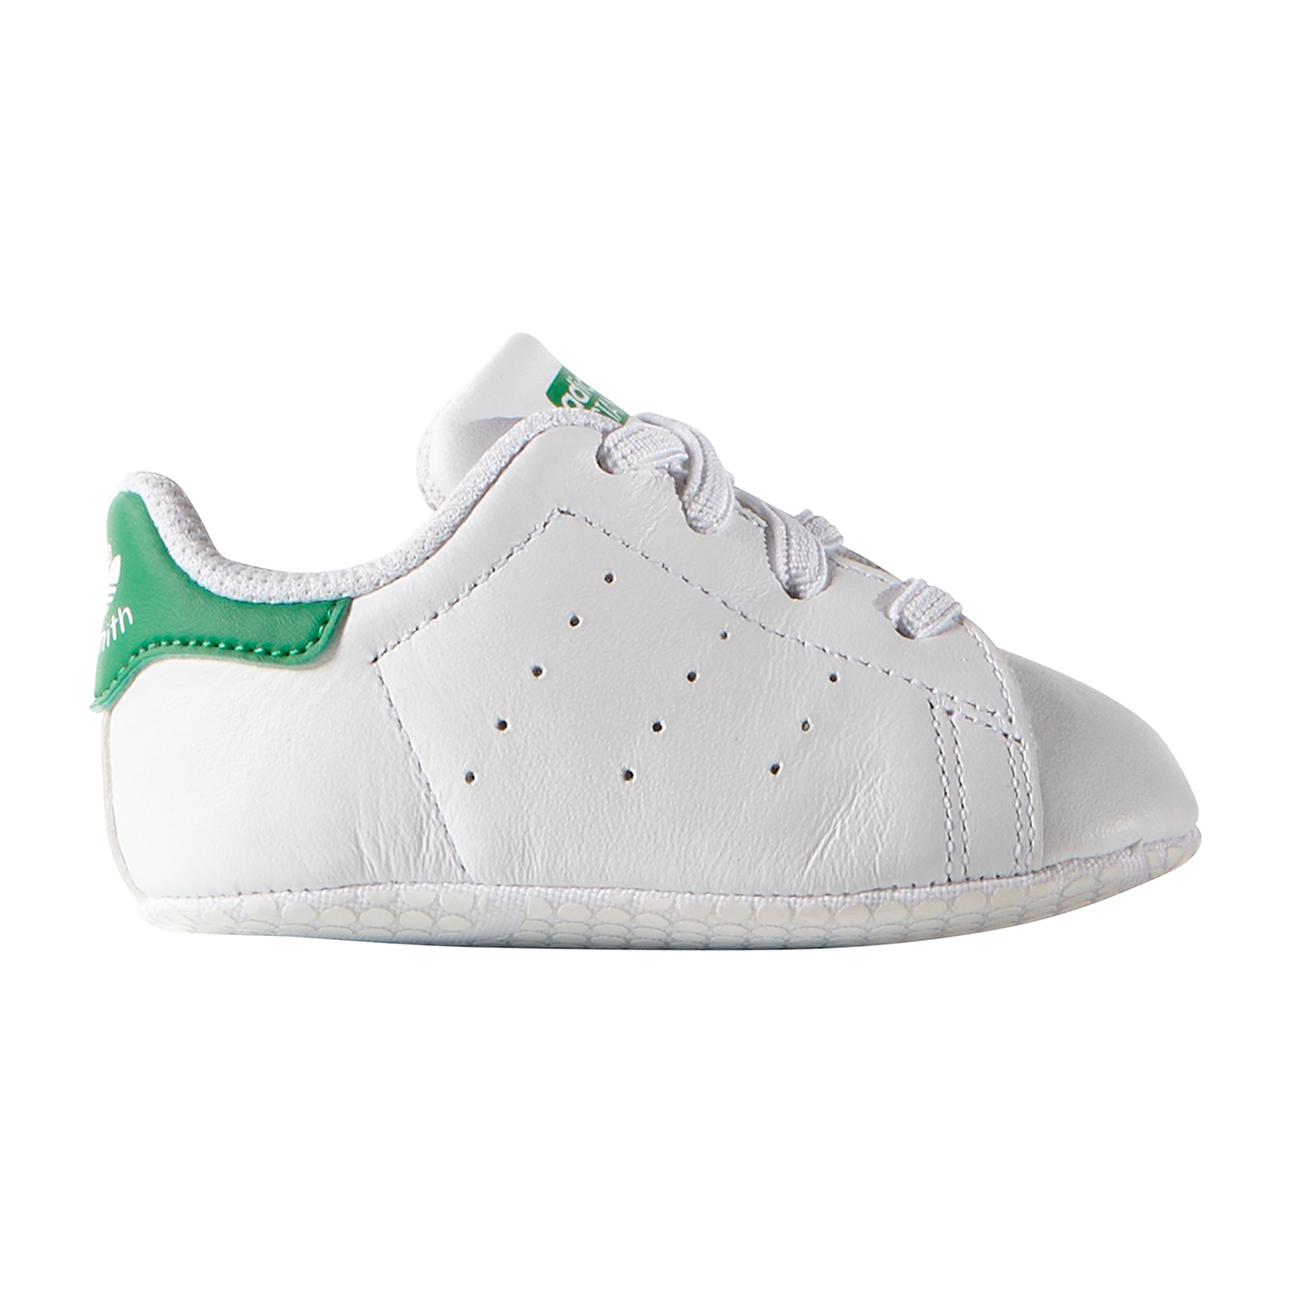 e1a47975 adidas Baby Stan Smith Sneakers White/Green B24101